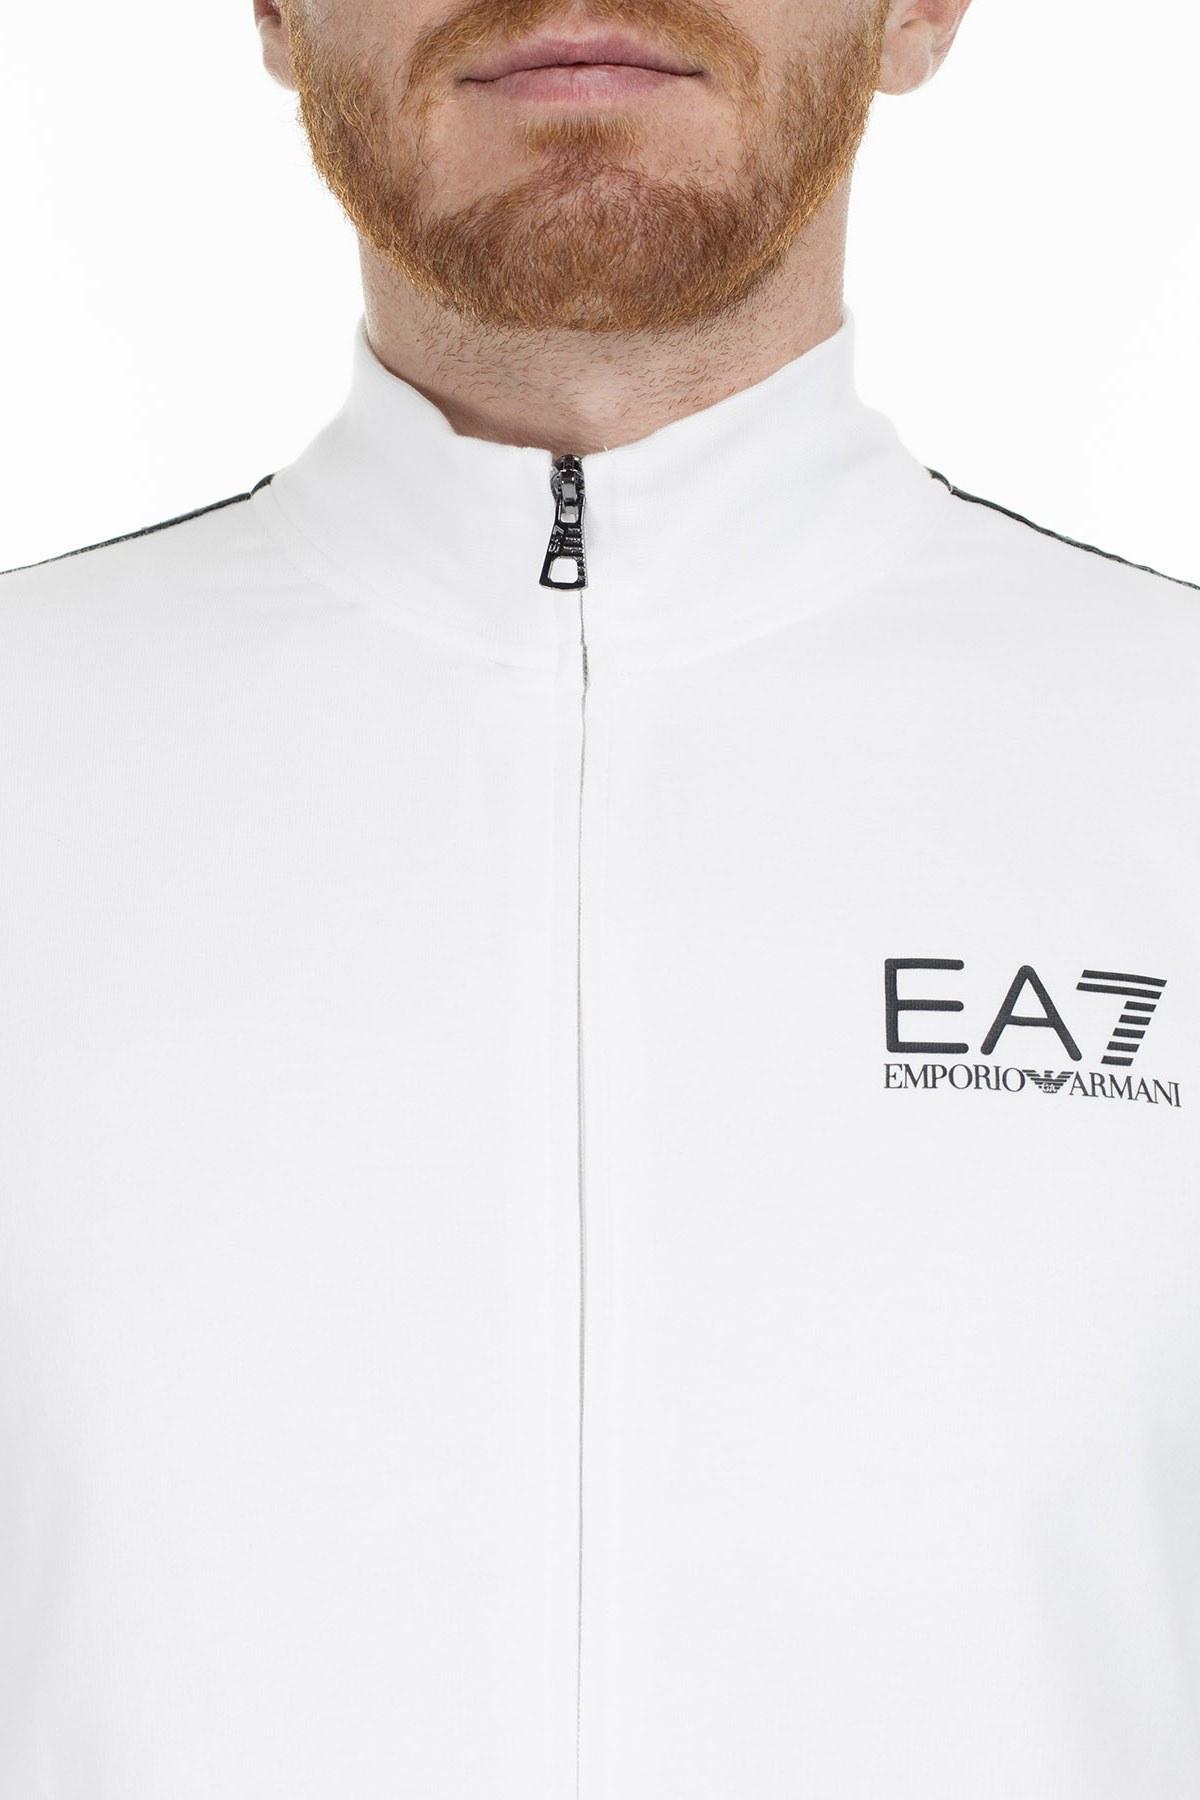 EA7 Erkek Sweat S 3GPM21 PJ05Z 1100 BEYAZ